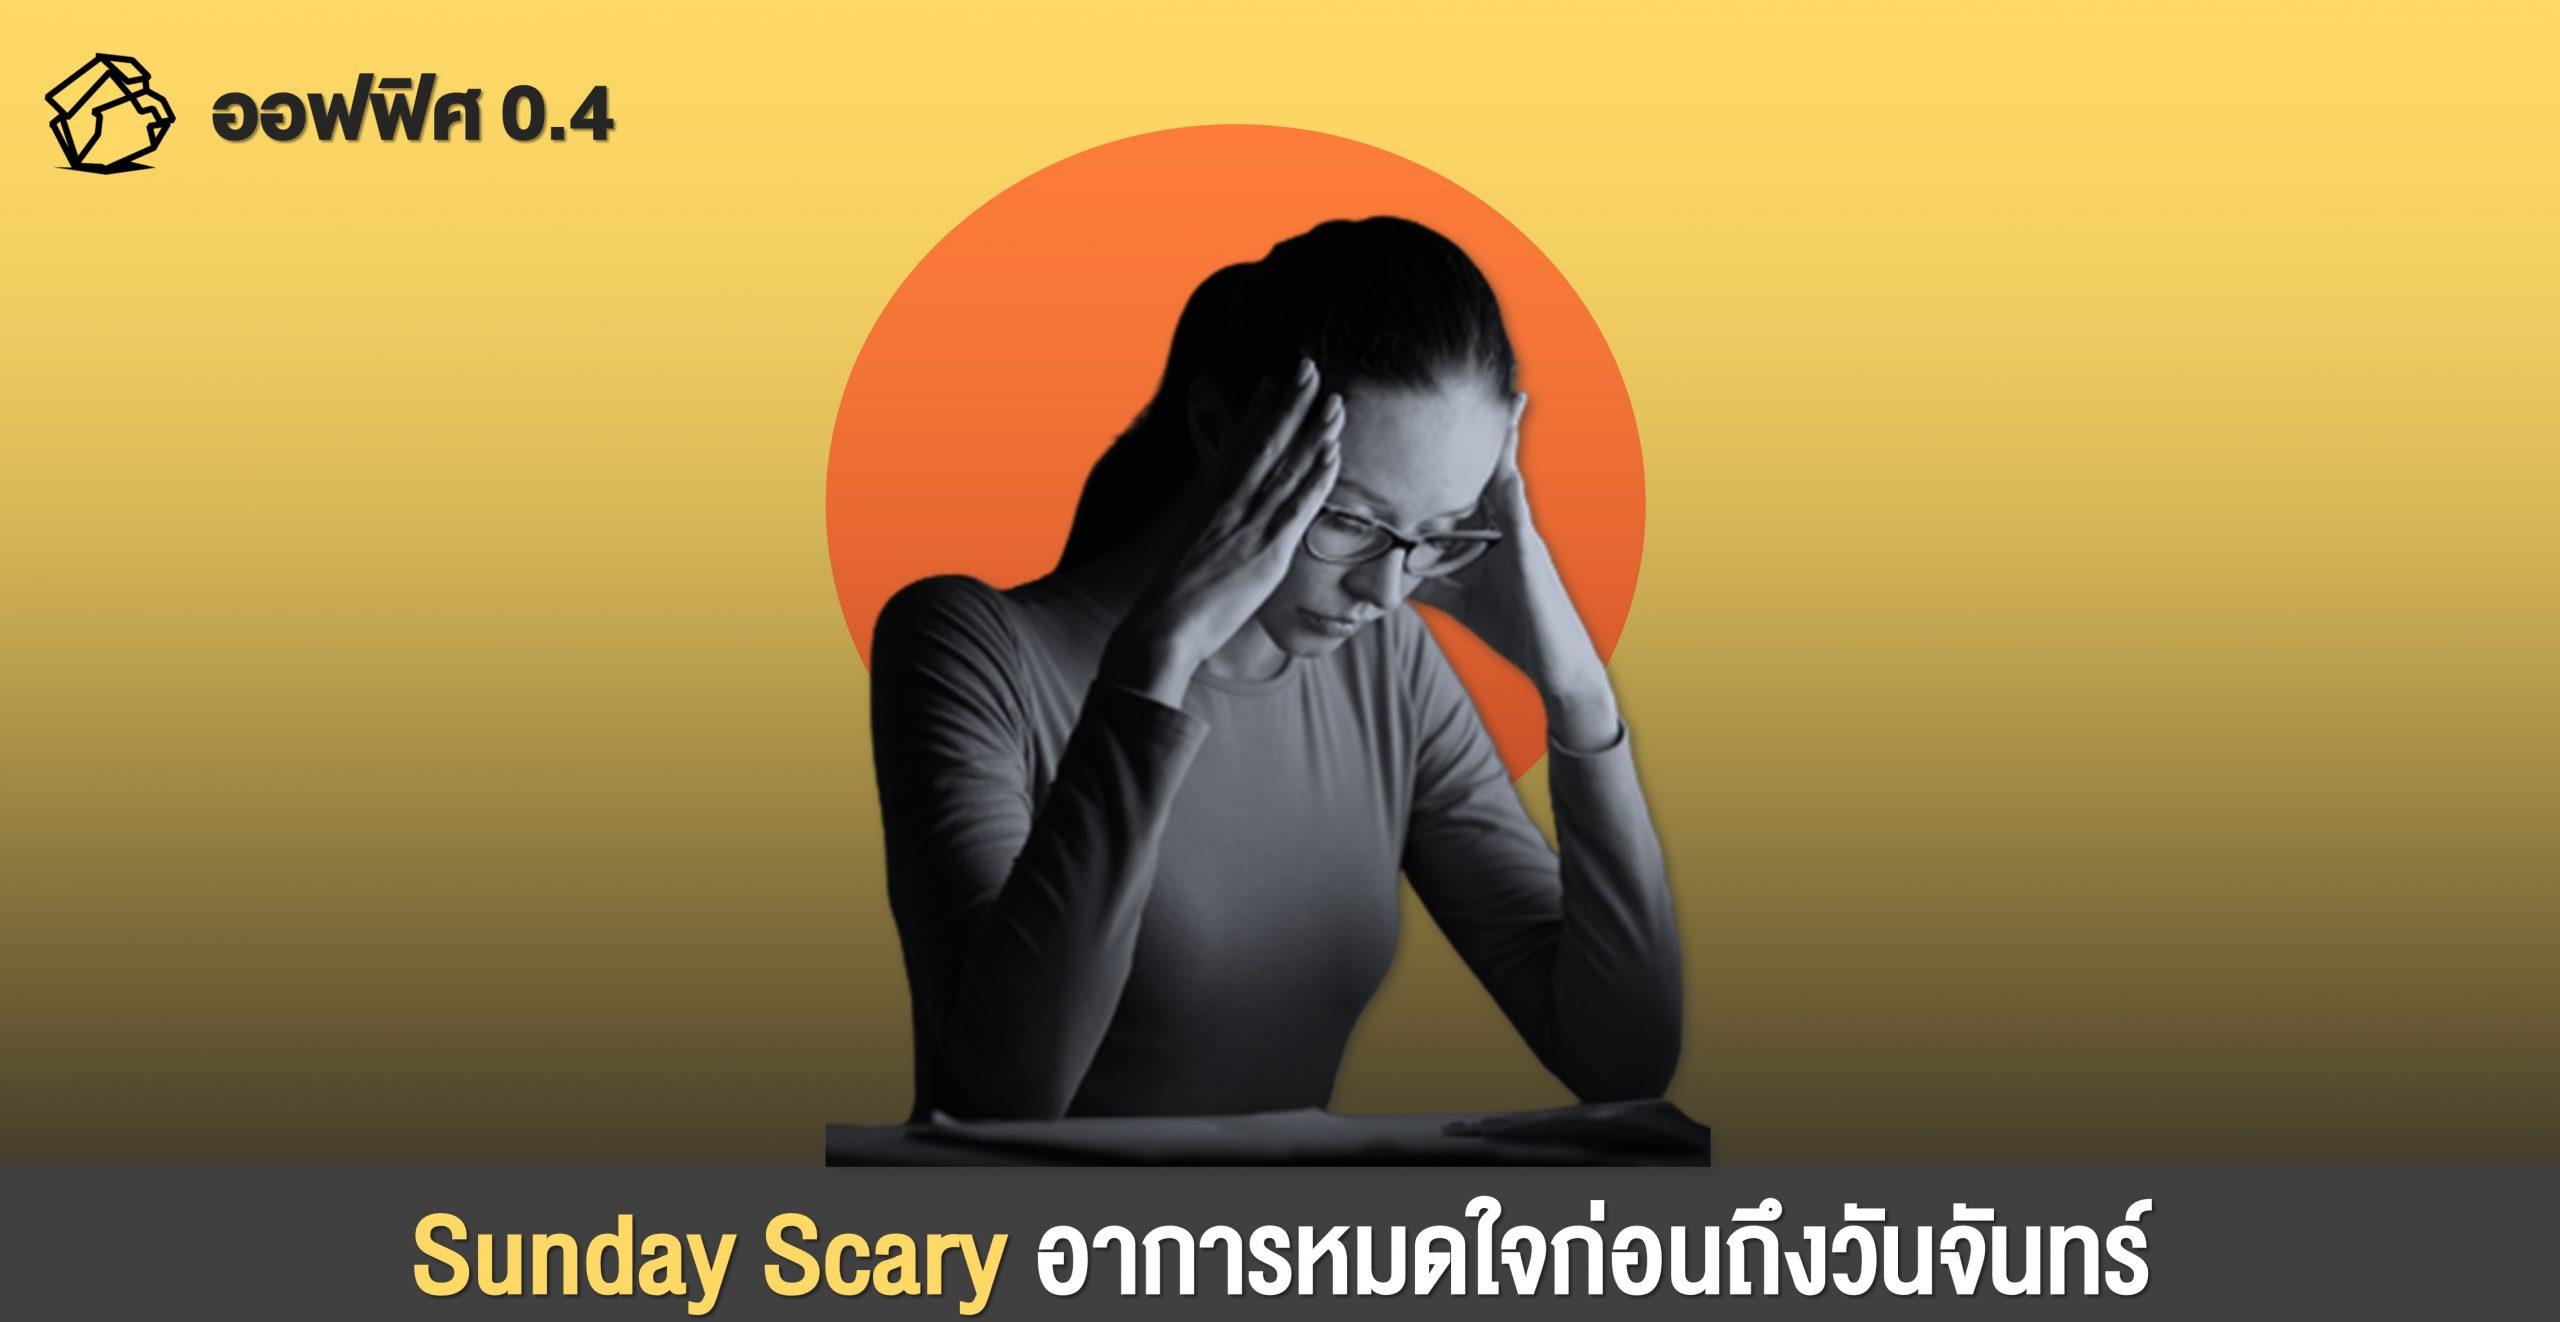 SundayScary